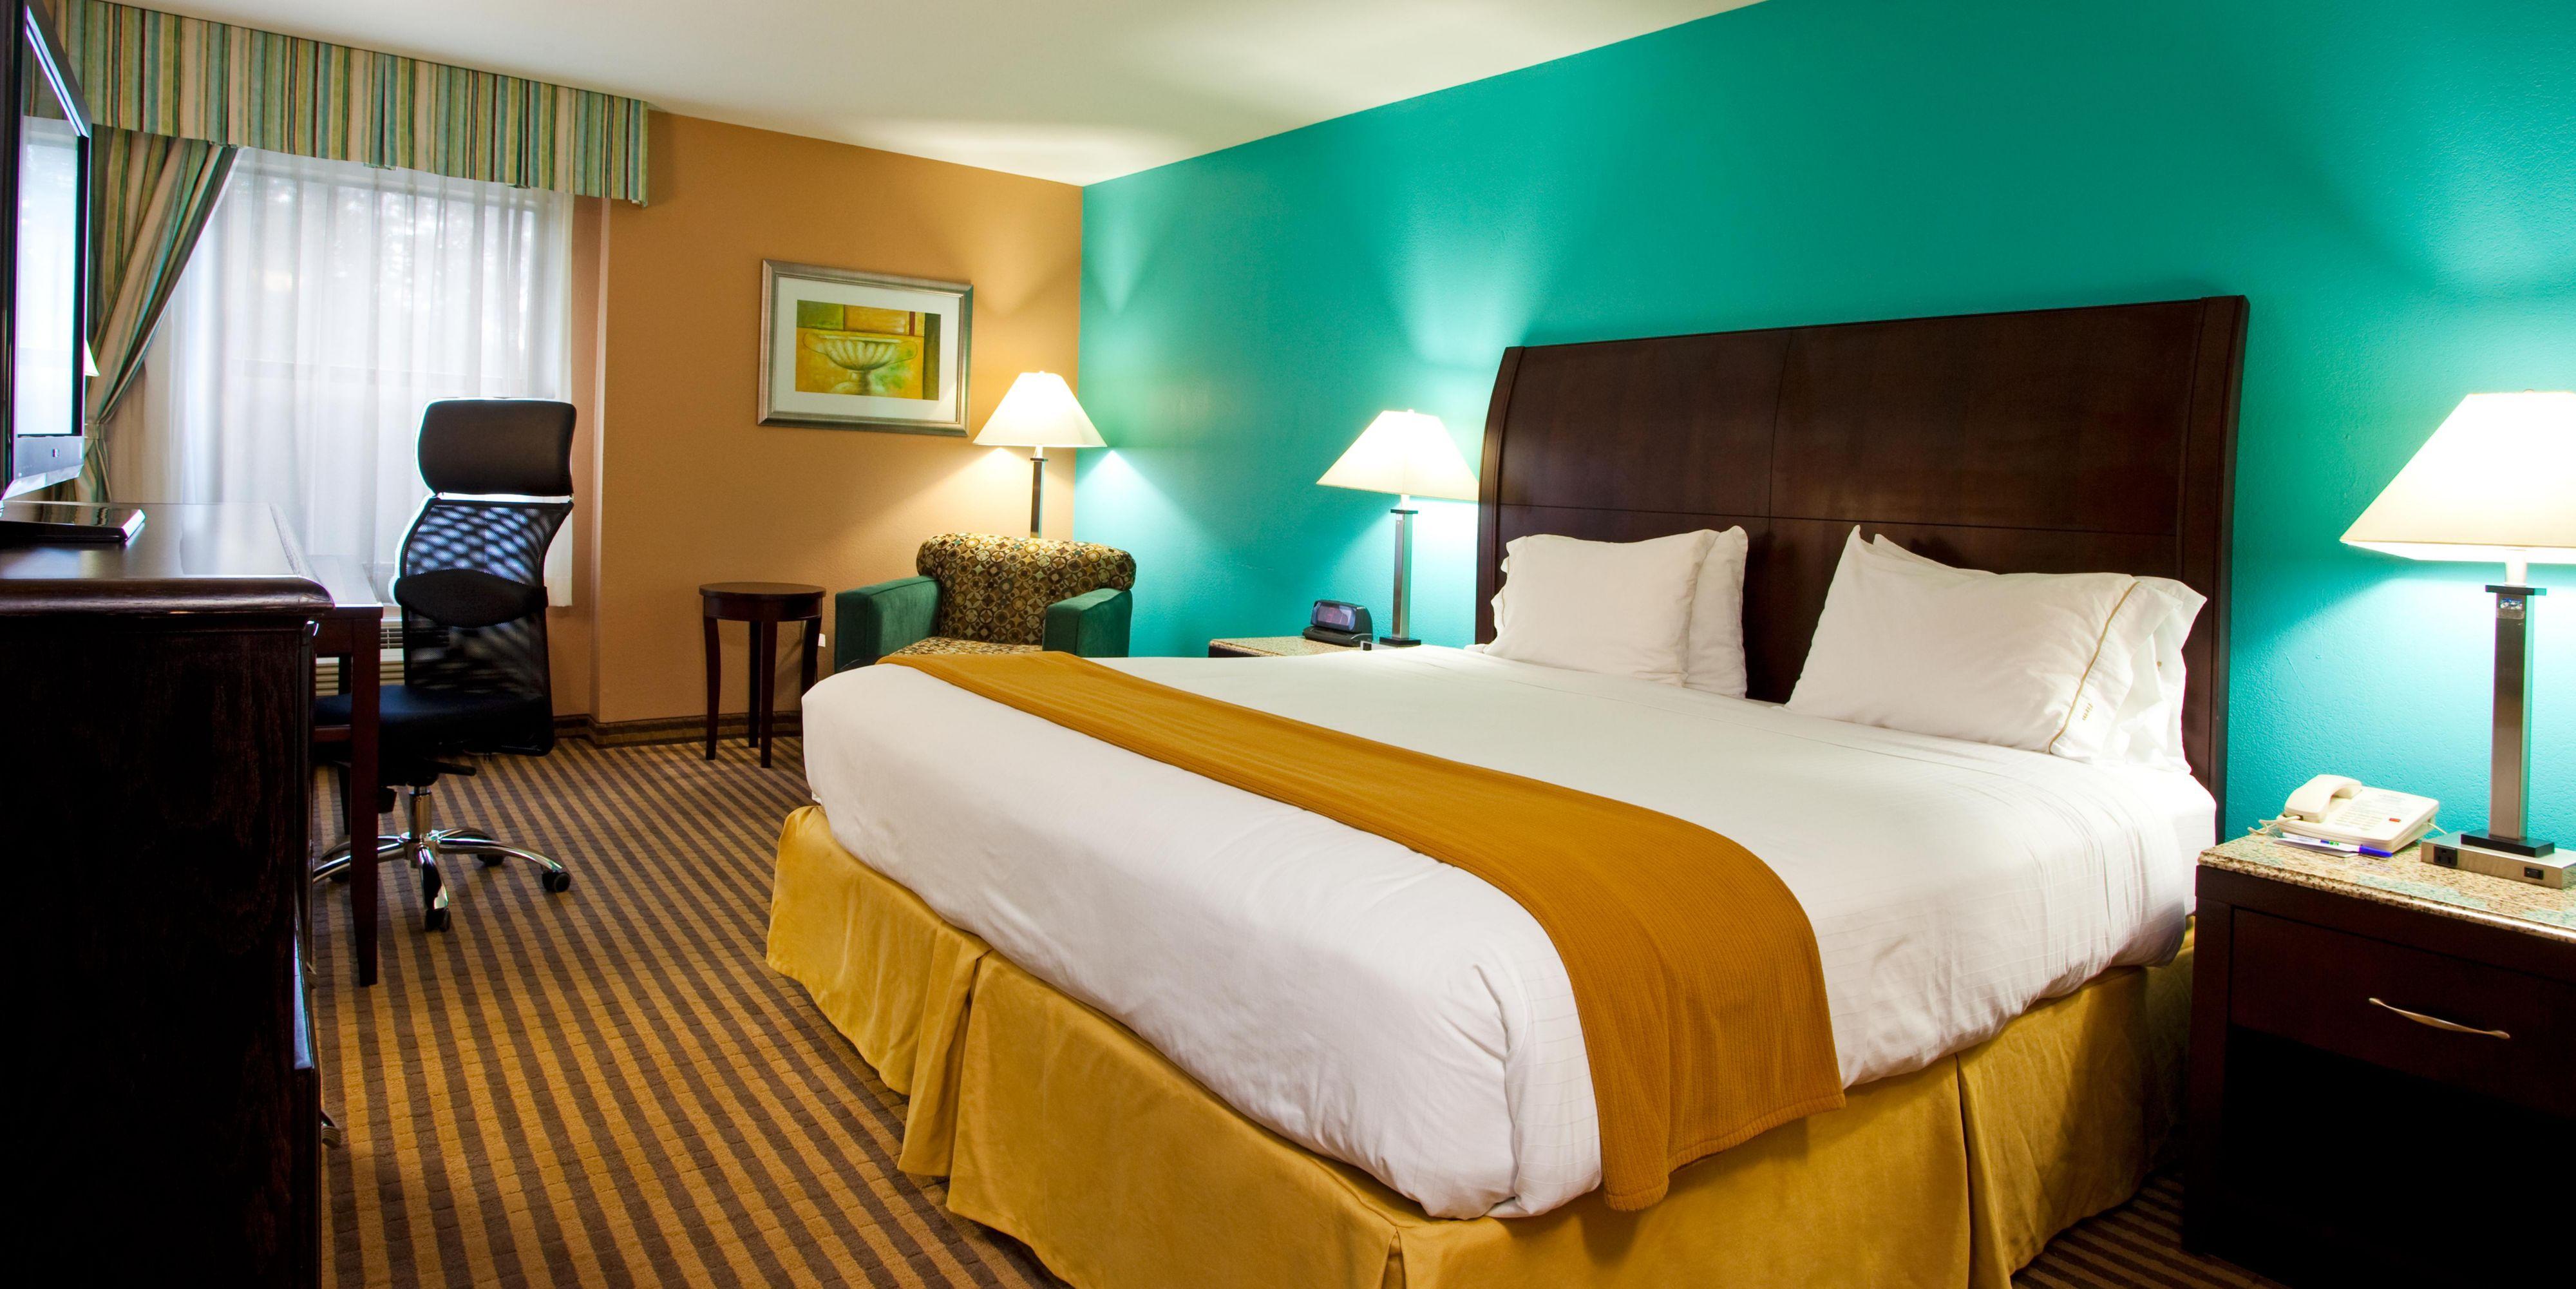 Holiday Inn Express Ocala 4288585784 2x1